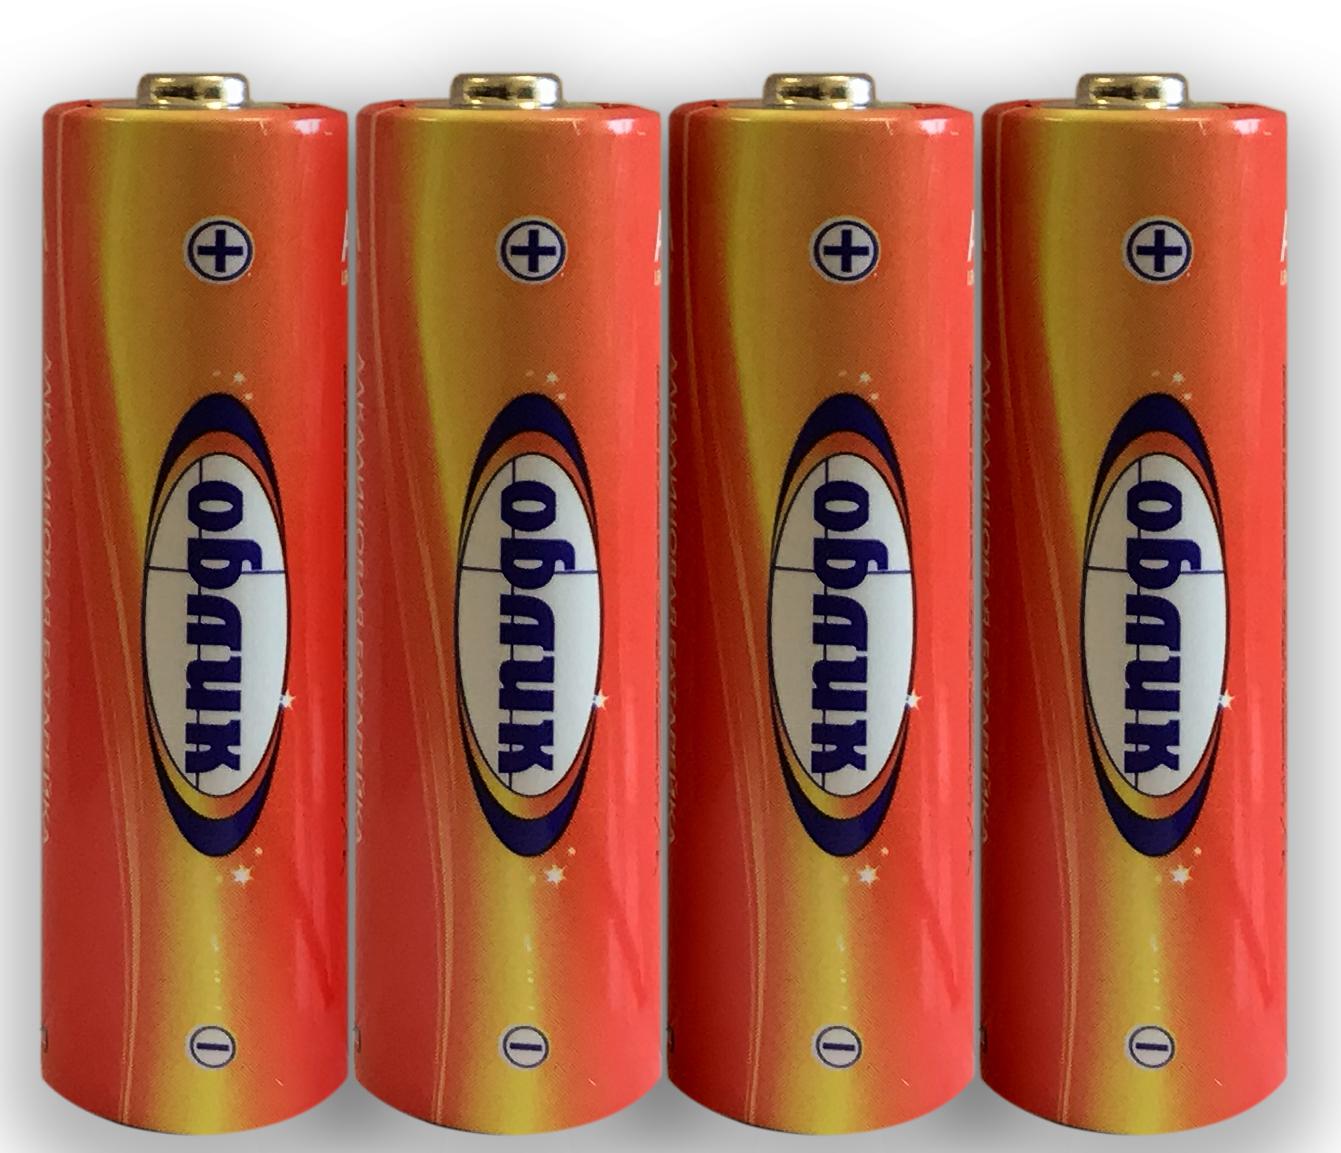 Батарейка Облик Алкалиновый элемент питания LR6 (AA) батарейка d panasonic zinc carbon r20rz 2bp r20 bl2 2 штуки